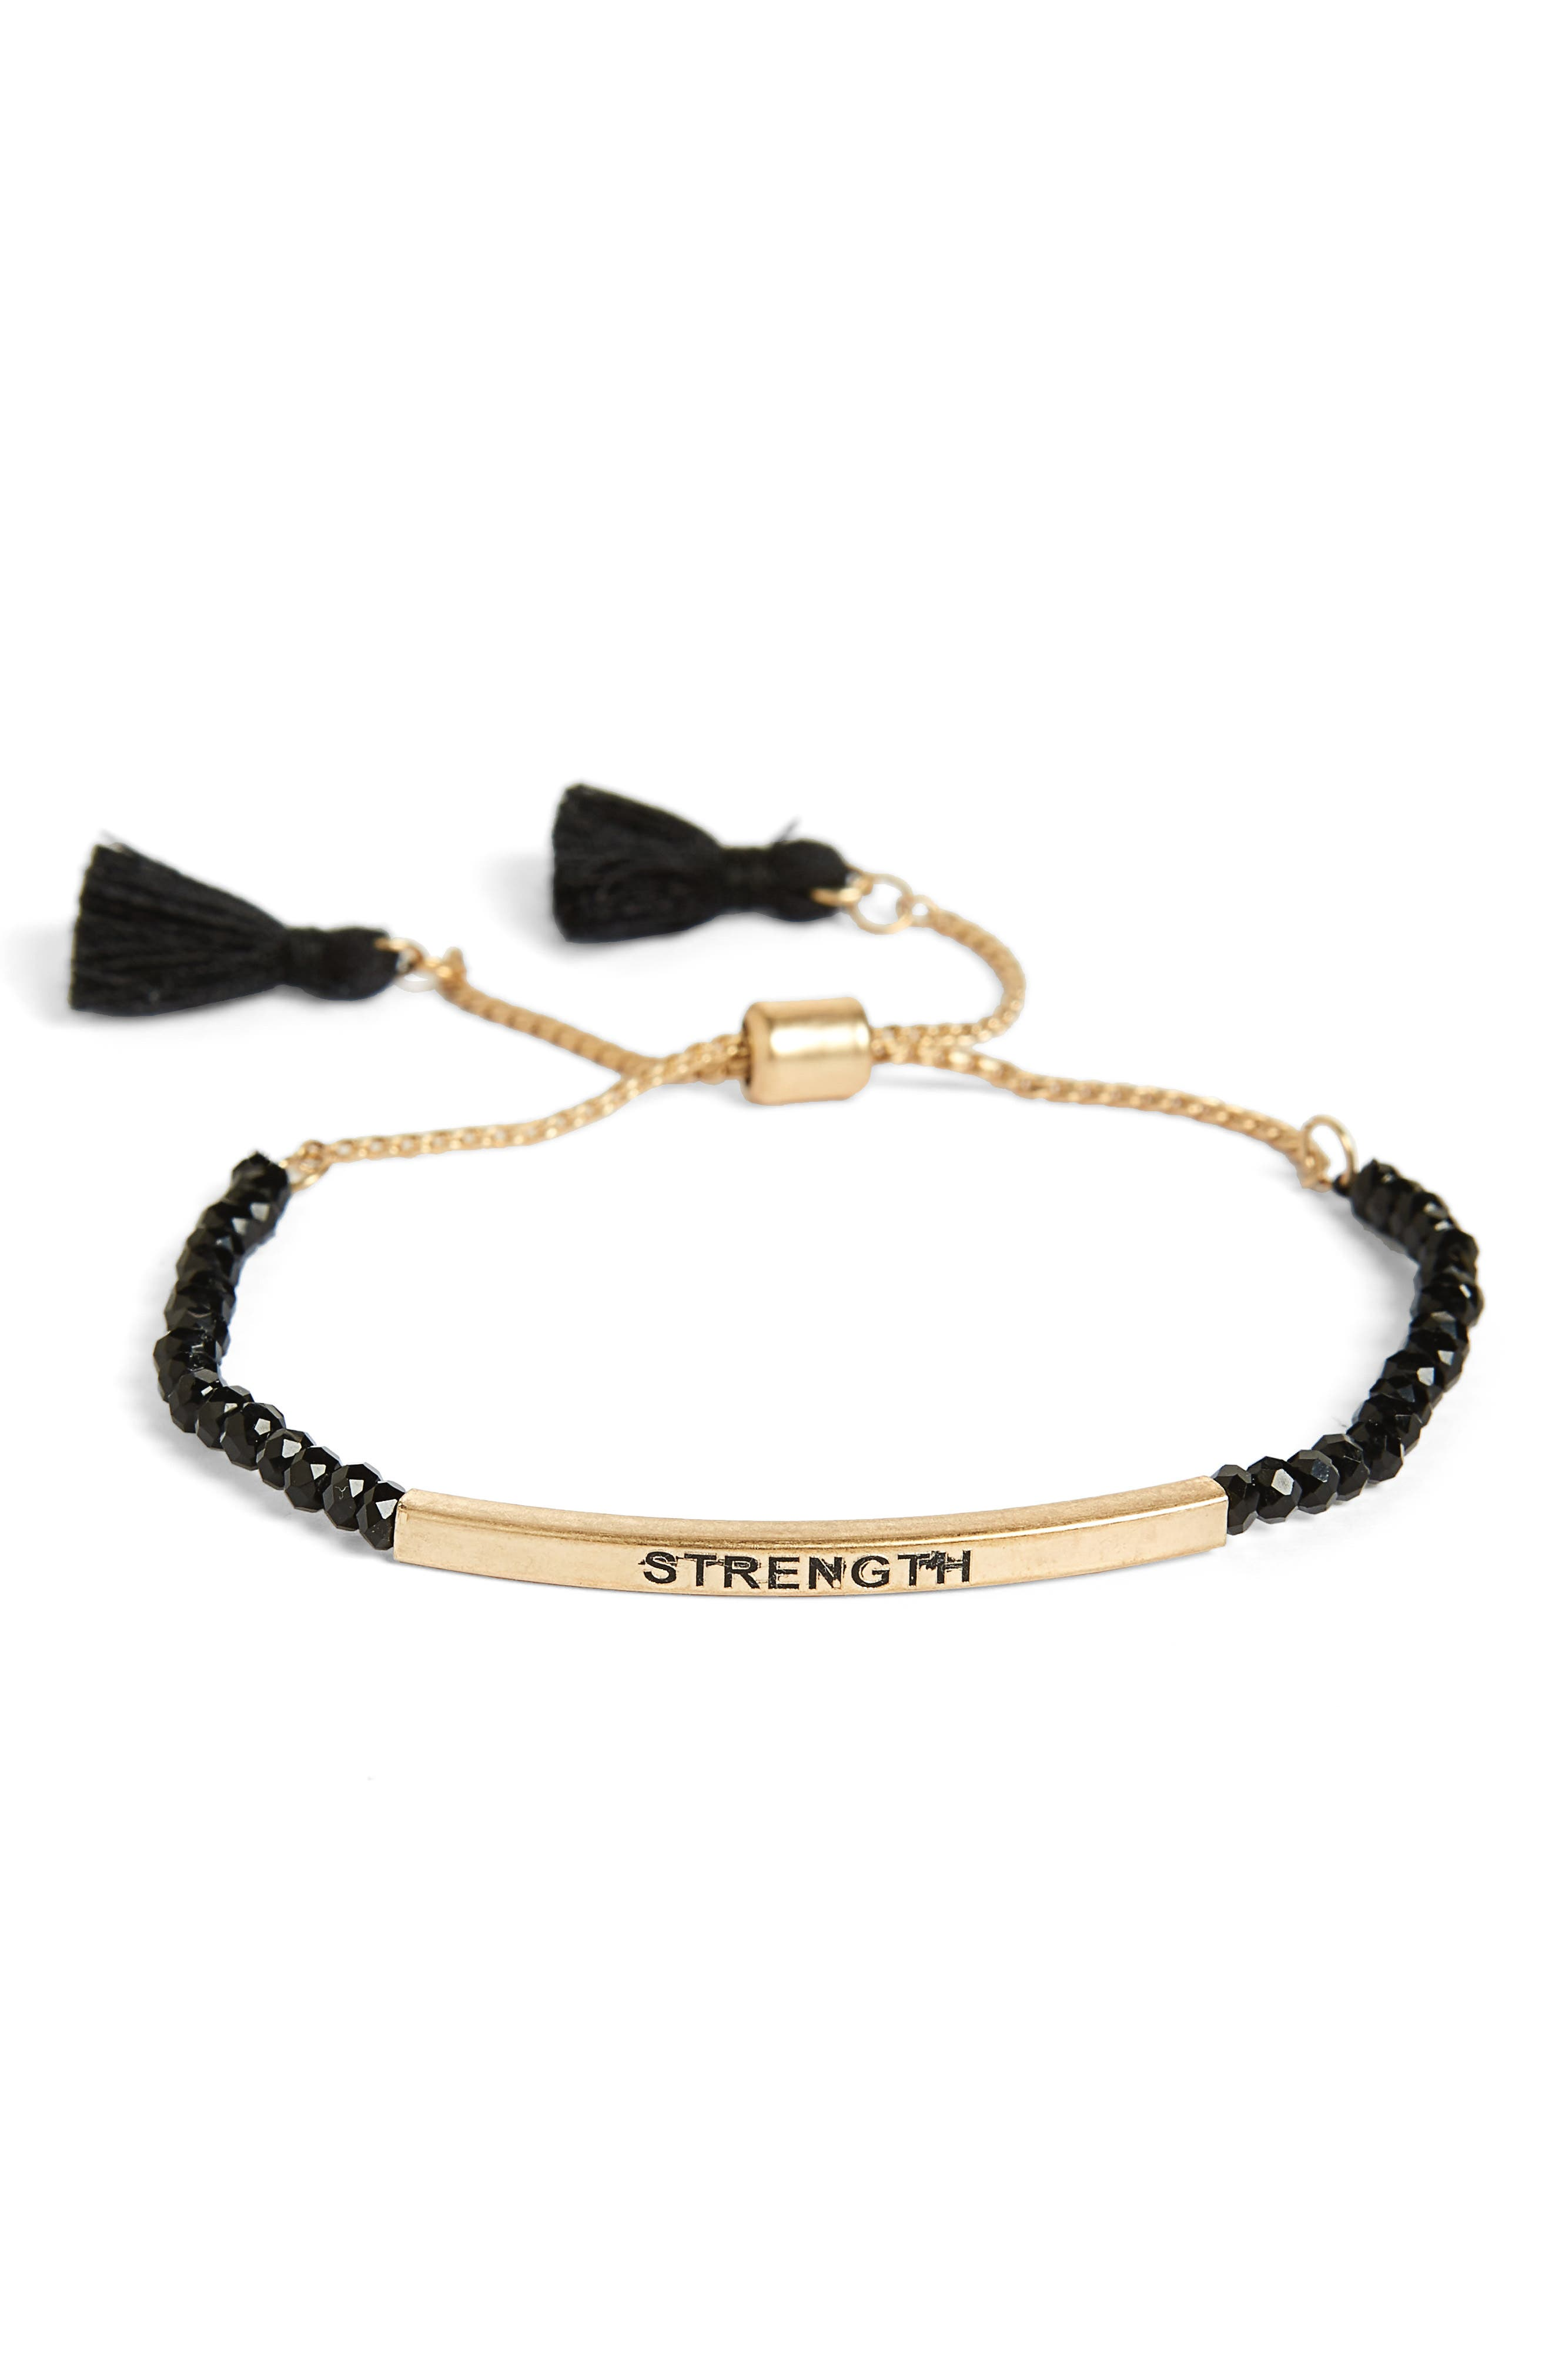 Bead & Metal Bar Bolo Bracelet,                             Main thumbnail 1, color,                             Black